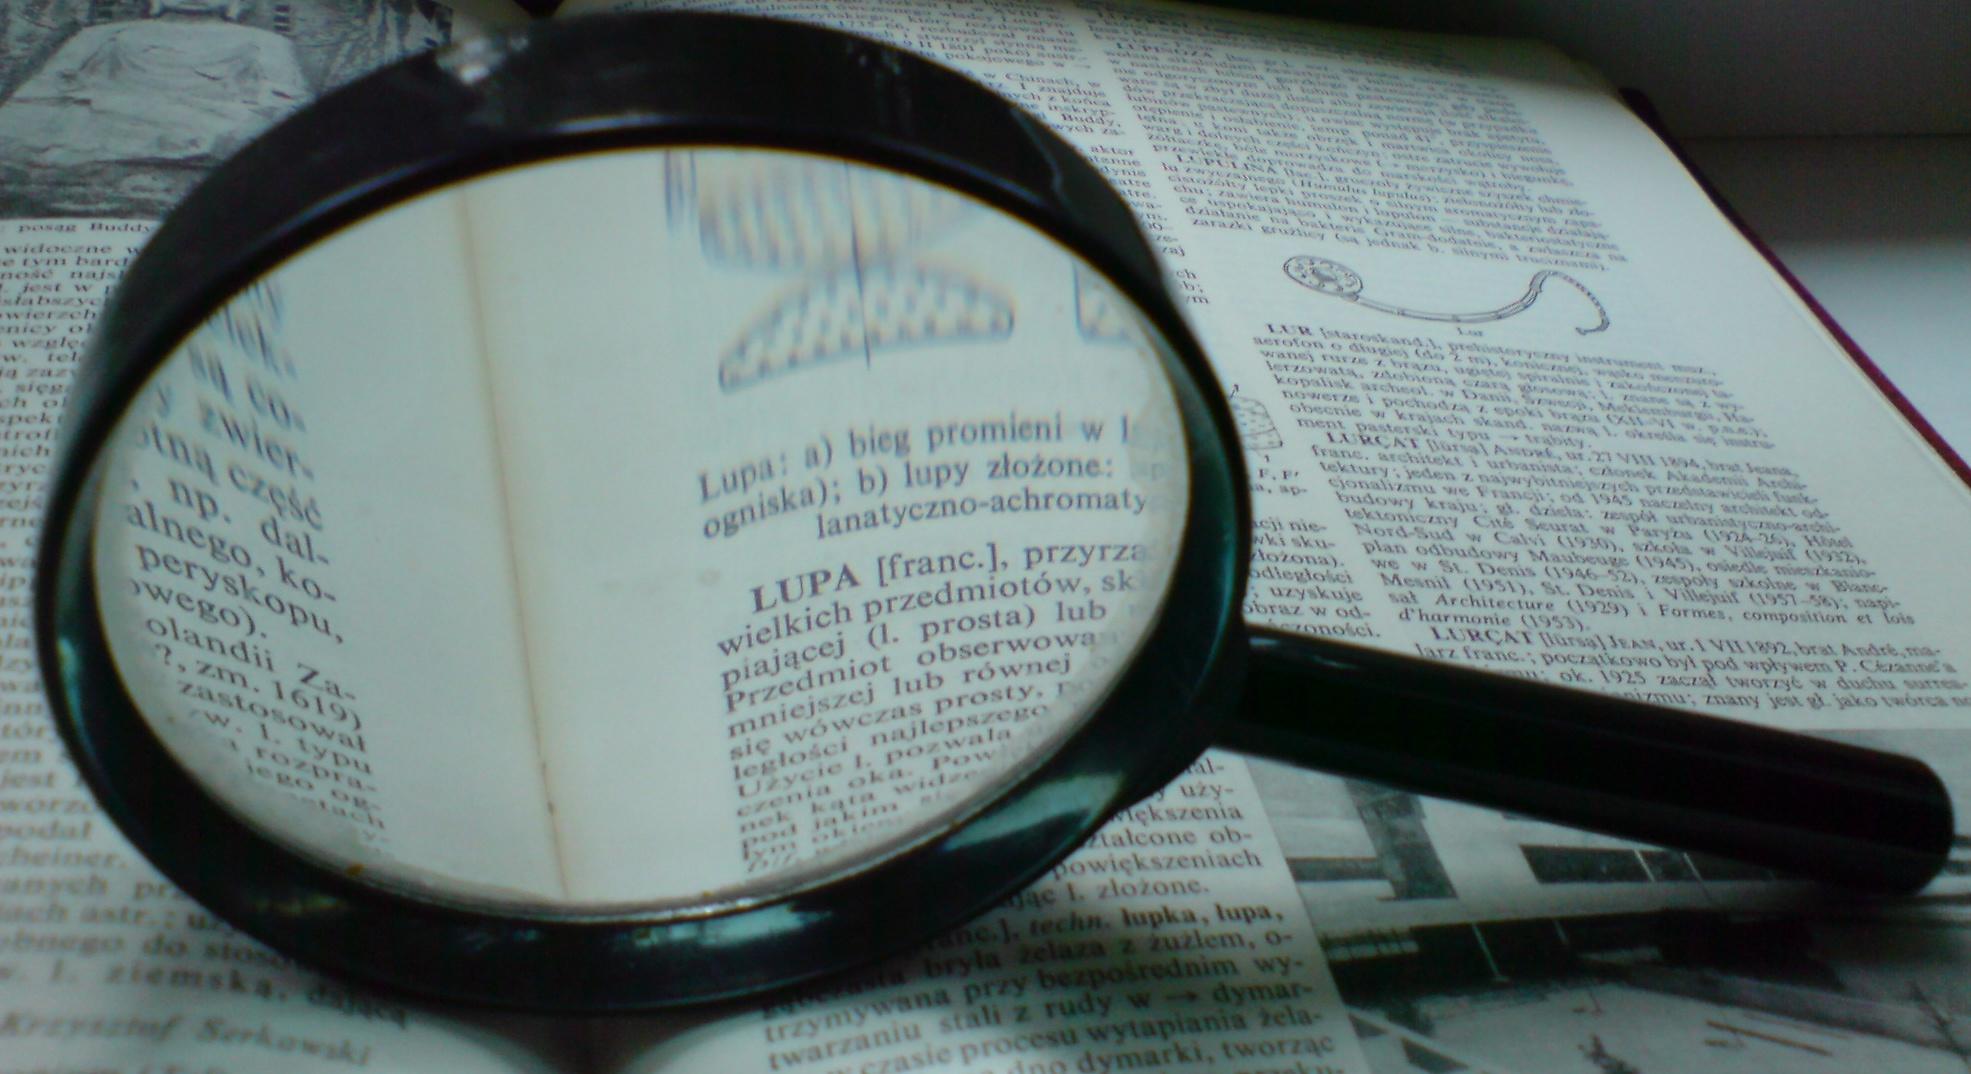 Istraživačko novinarstvo. Izvor: http://upload.wikimedia.org/wikipedia/commons/f/f4/Lupa.na.encyklopedii.jpg?uselang=sl